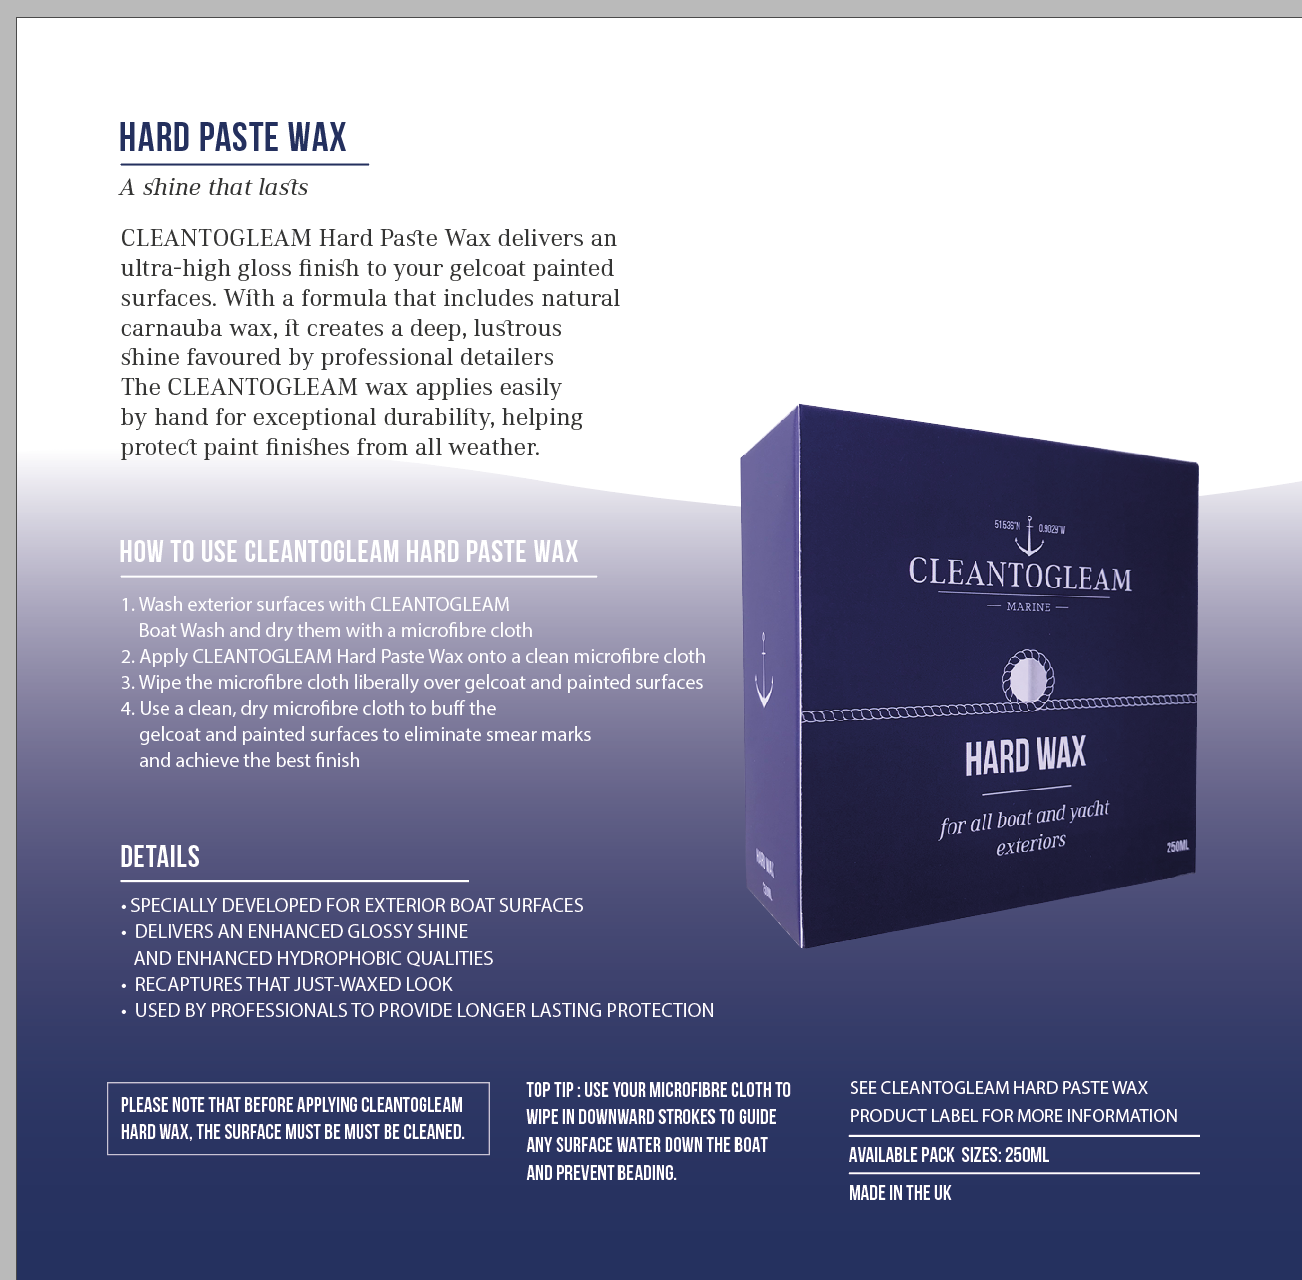 Cleantogleam's Hard Paste Wax - CleanToGleam